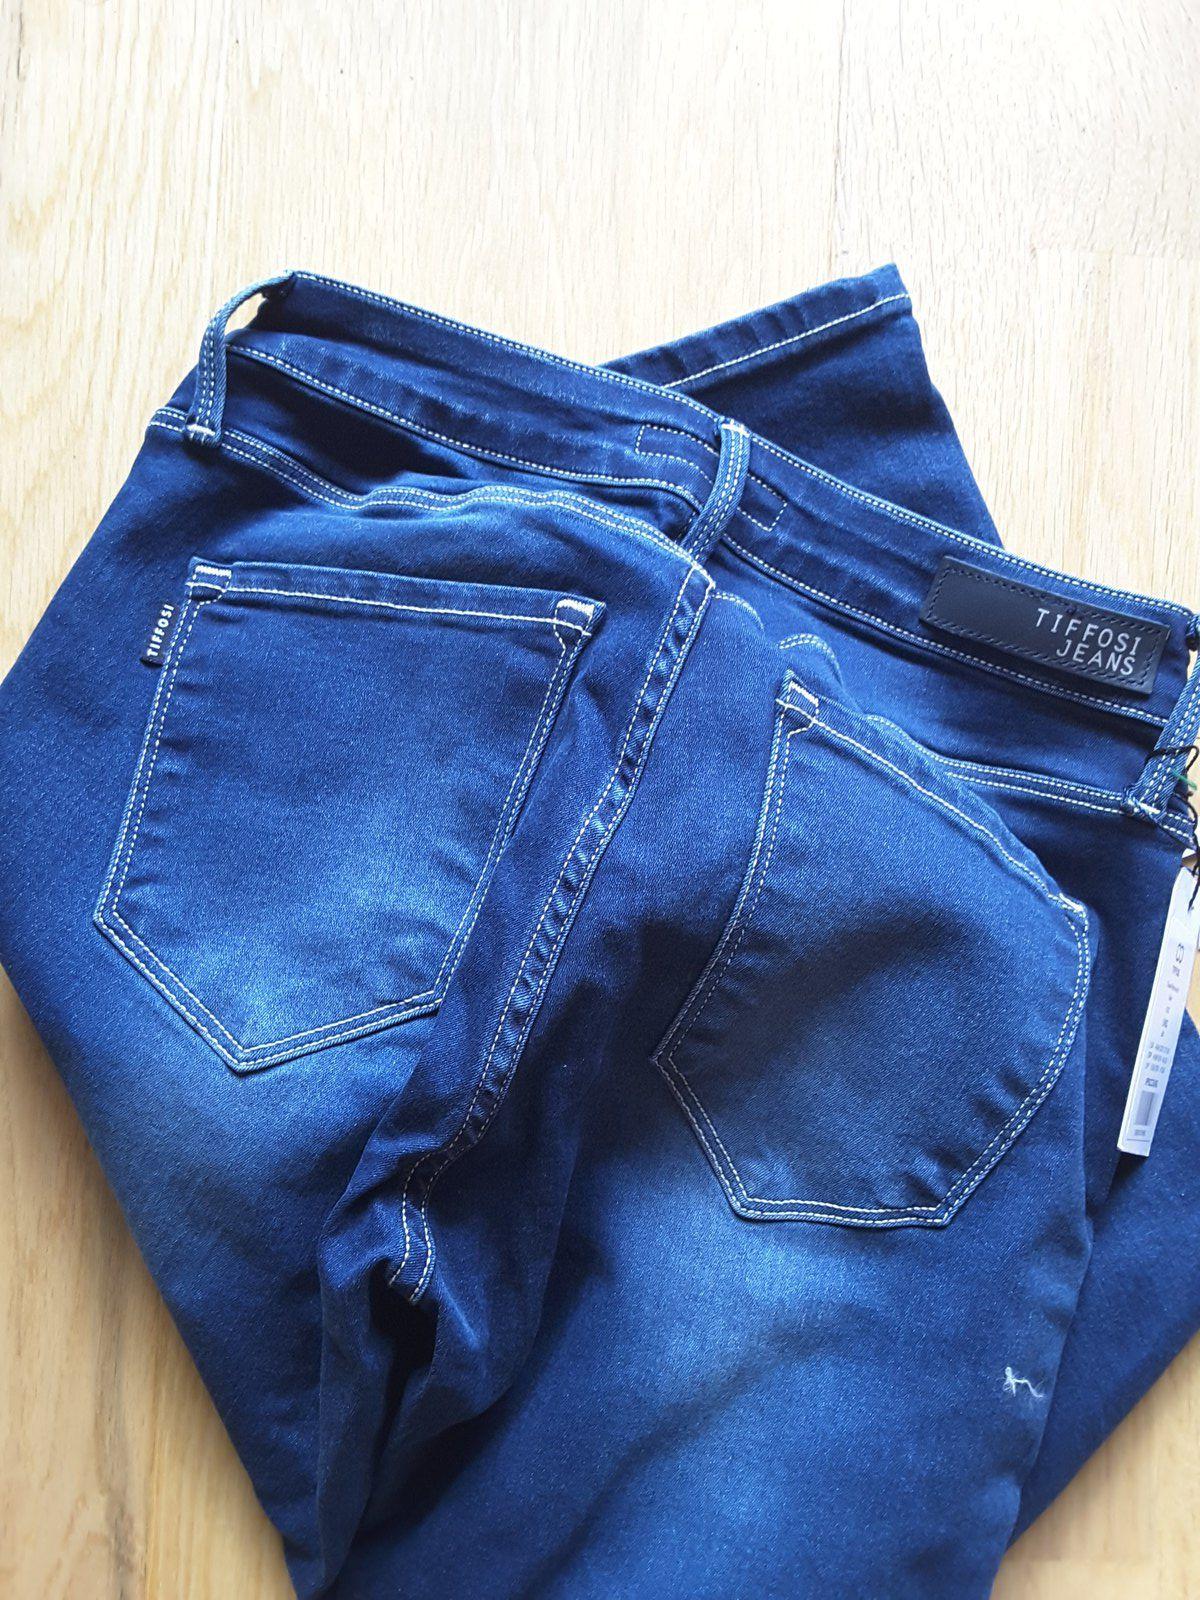 lookiero Tista Pant one3 Blue - Tiffosi missbonsplansdunet box vêtements styliste personal shopper